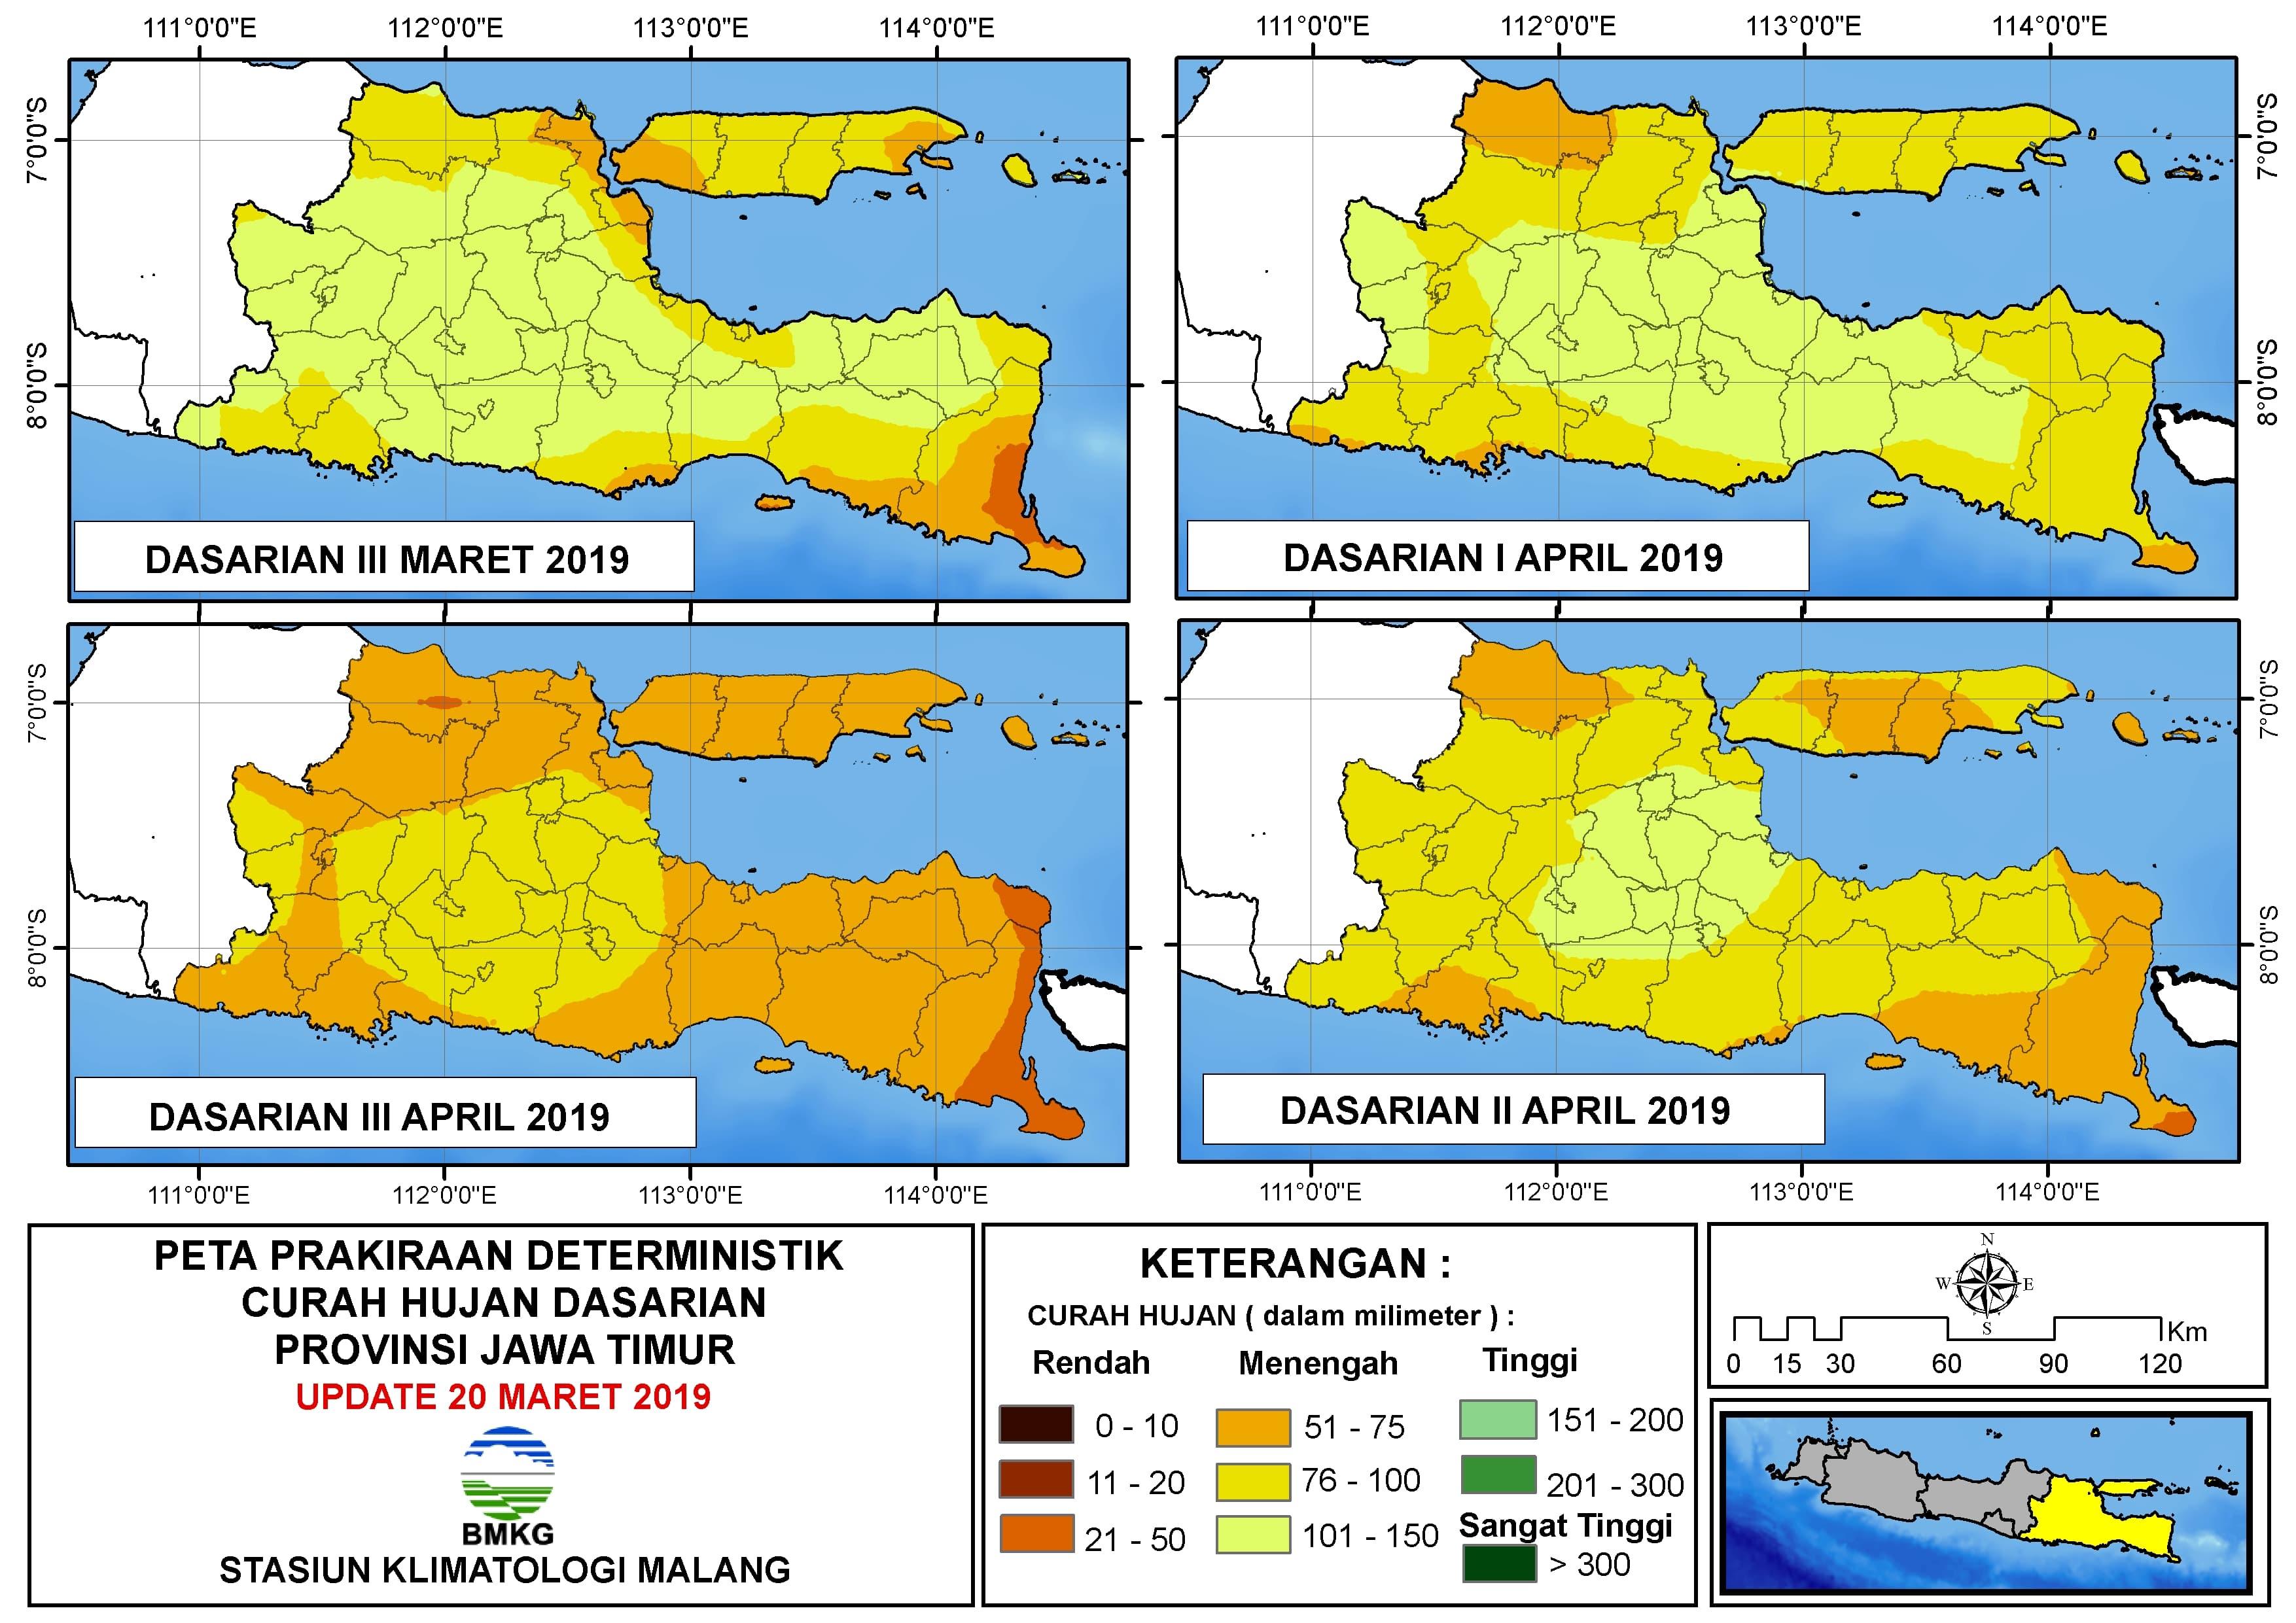 Peta Prakiraan Deterministik Curah Hujan Dasarian Provinsi Jawa Timur Update 20 Maret 2019